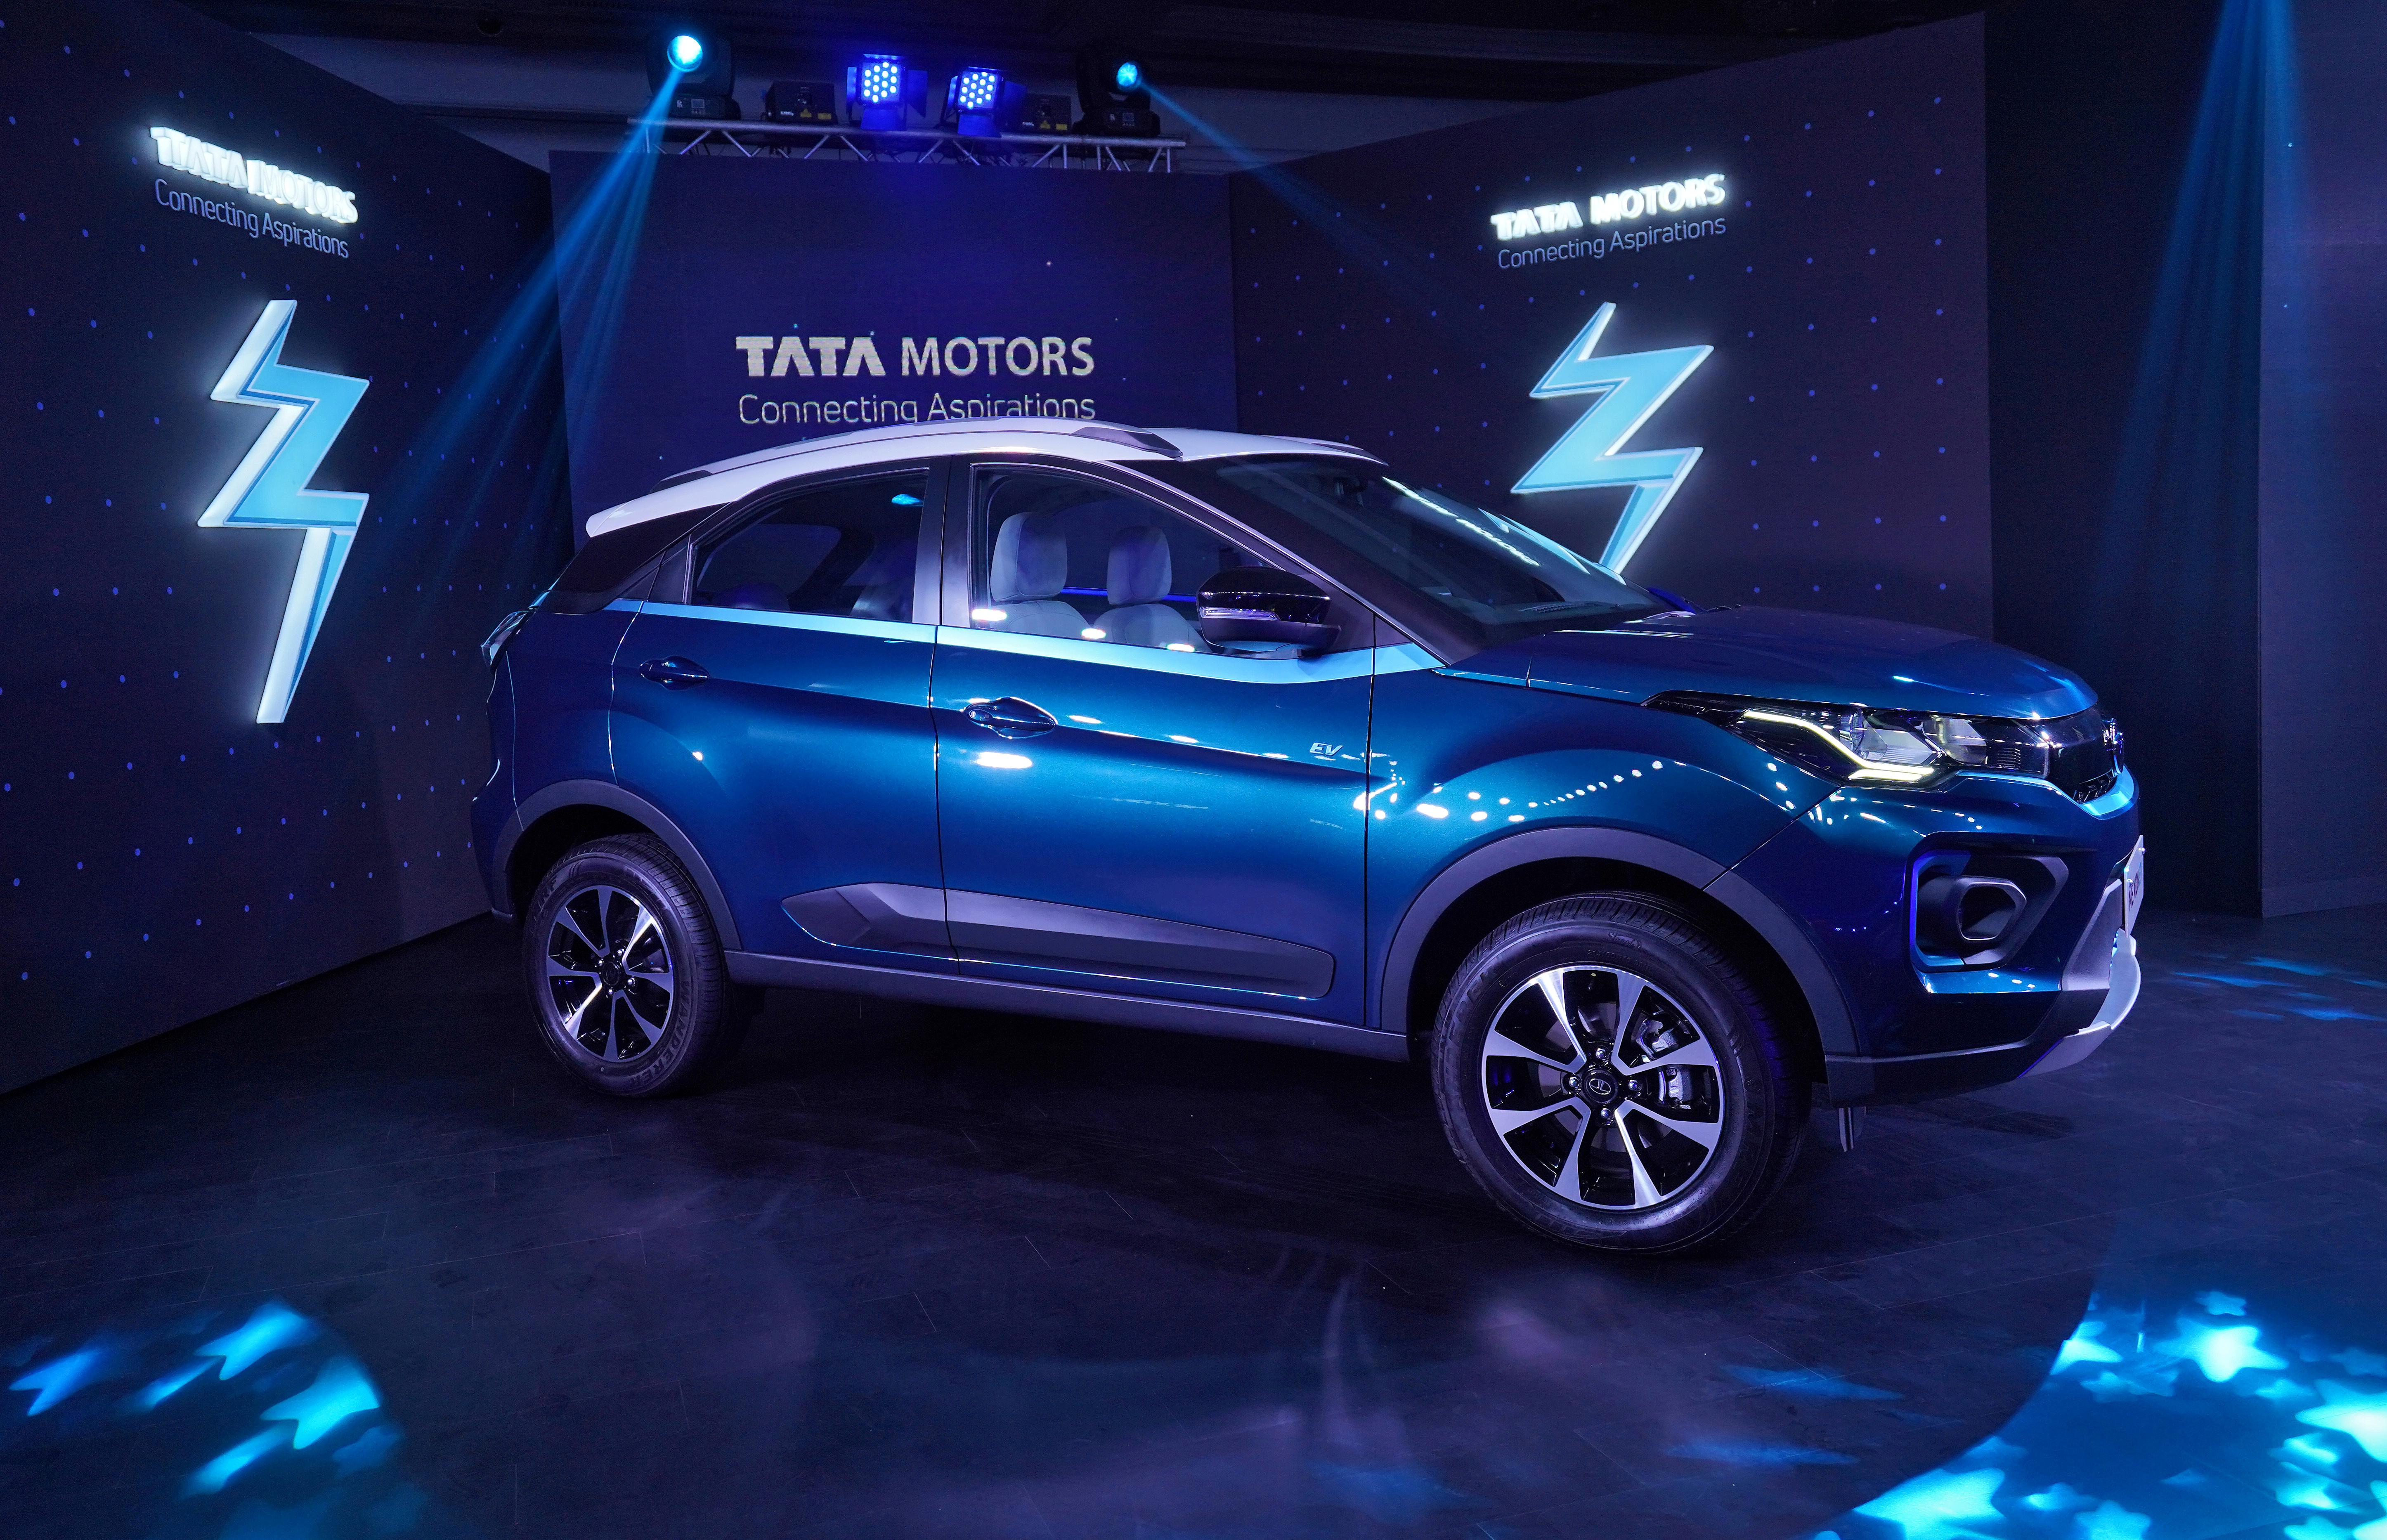 Tata Motors' electric sport utility vehicle (SUV) Nexon EV on show during its launch in Mumbai, India, January 28, 2020. REUTERS/Hemanshi Kamani/File Photo